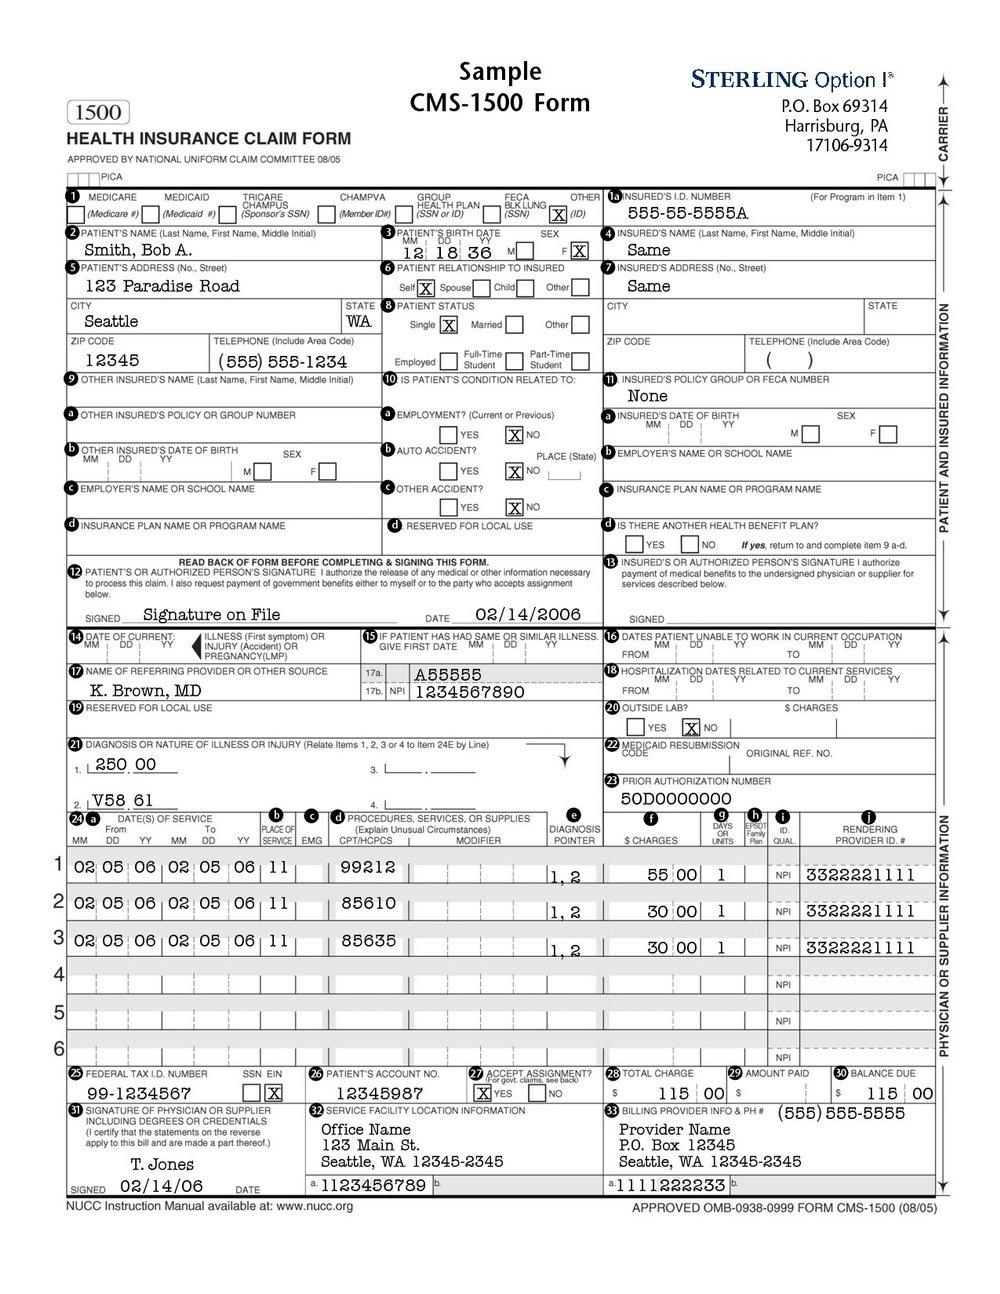 1500 Health Insurance Claim Form Pdf